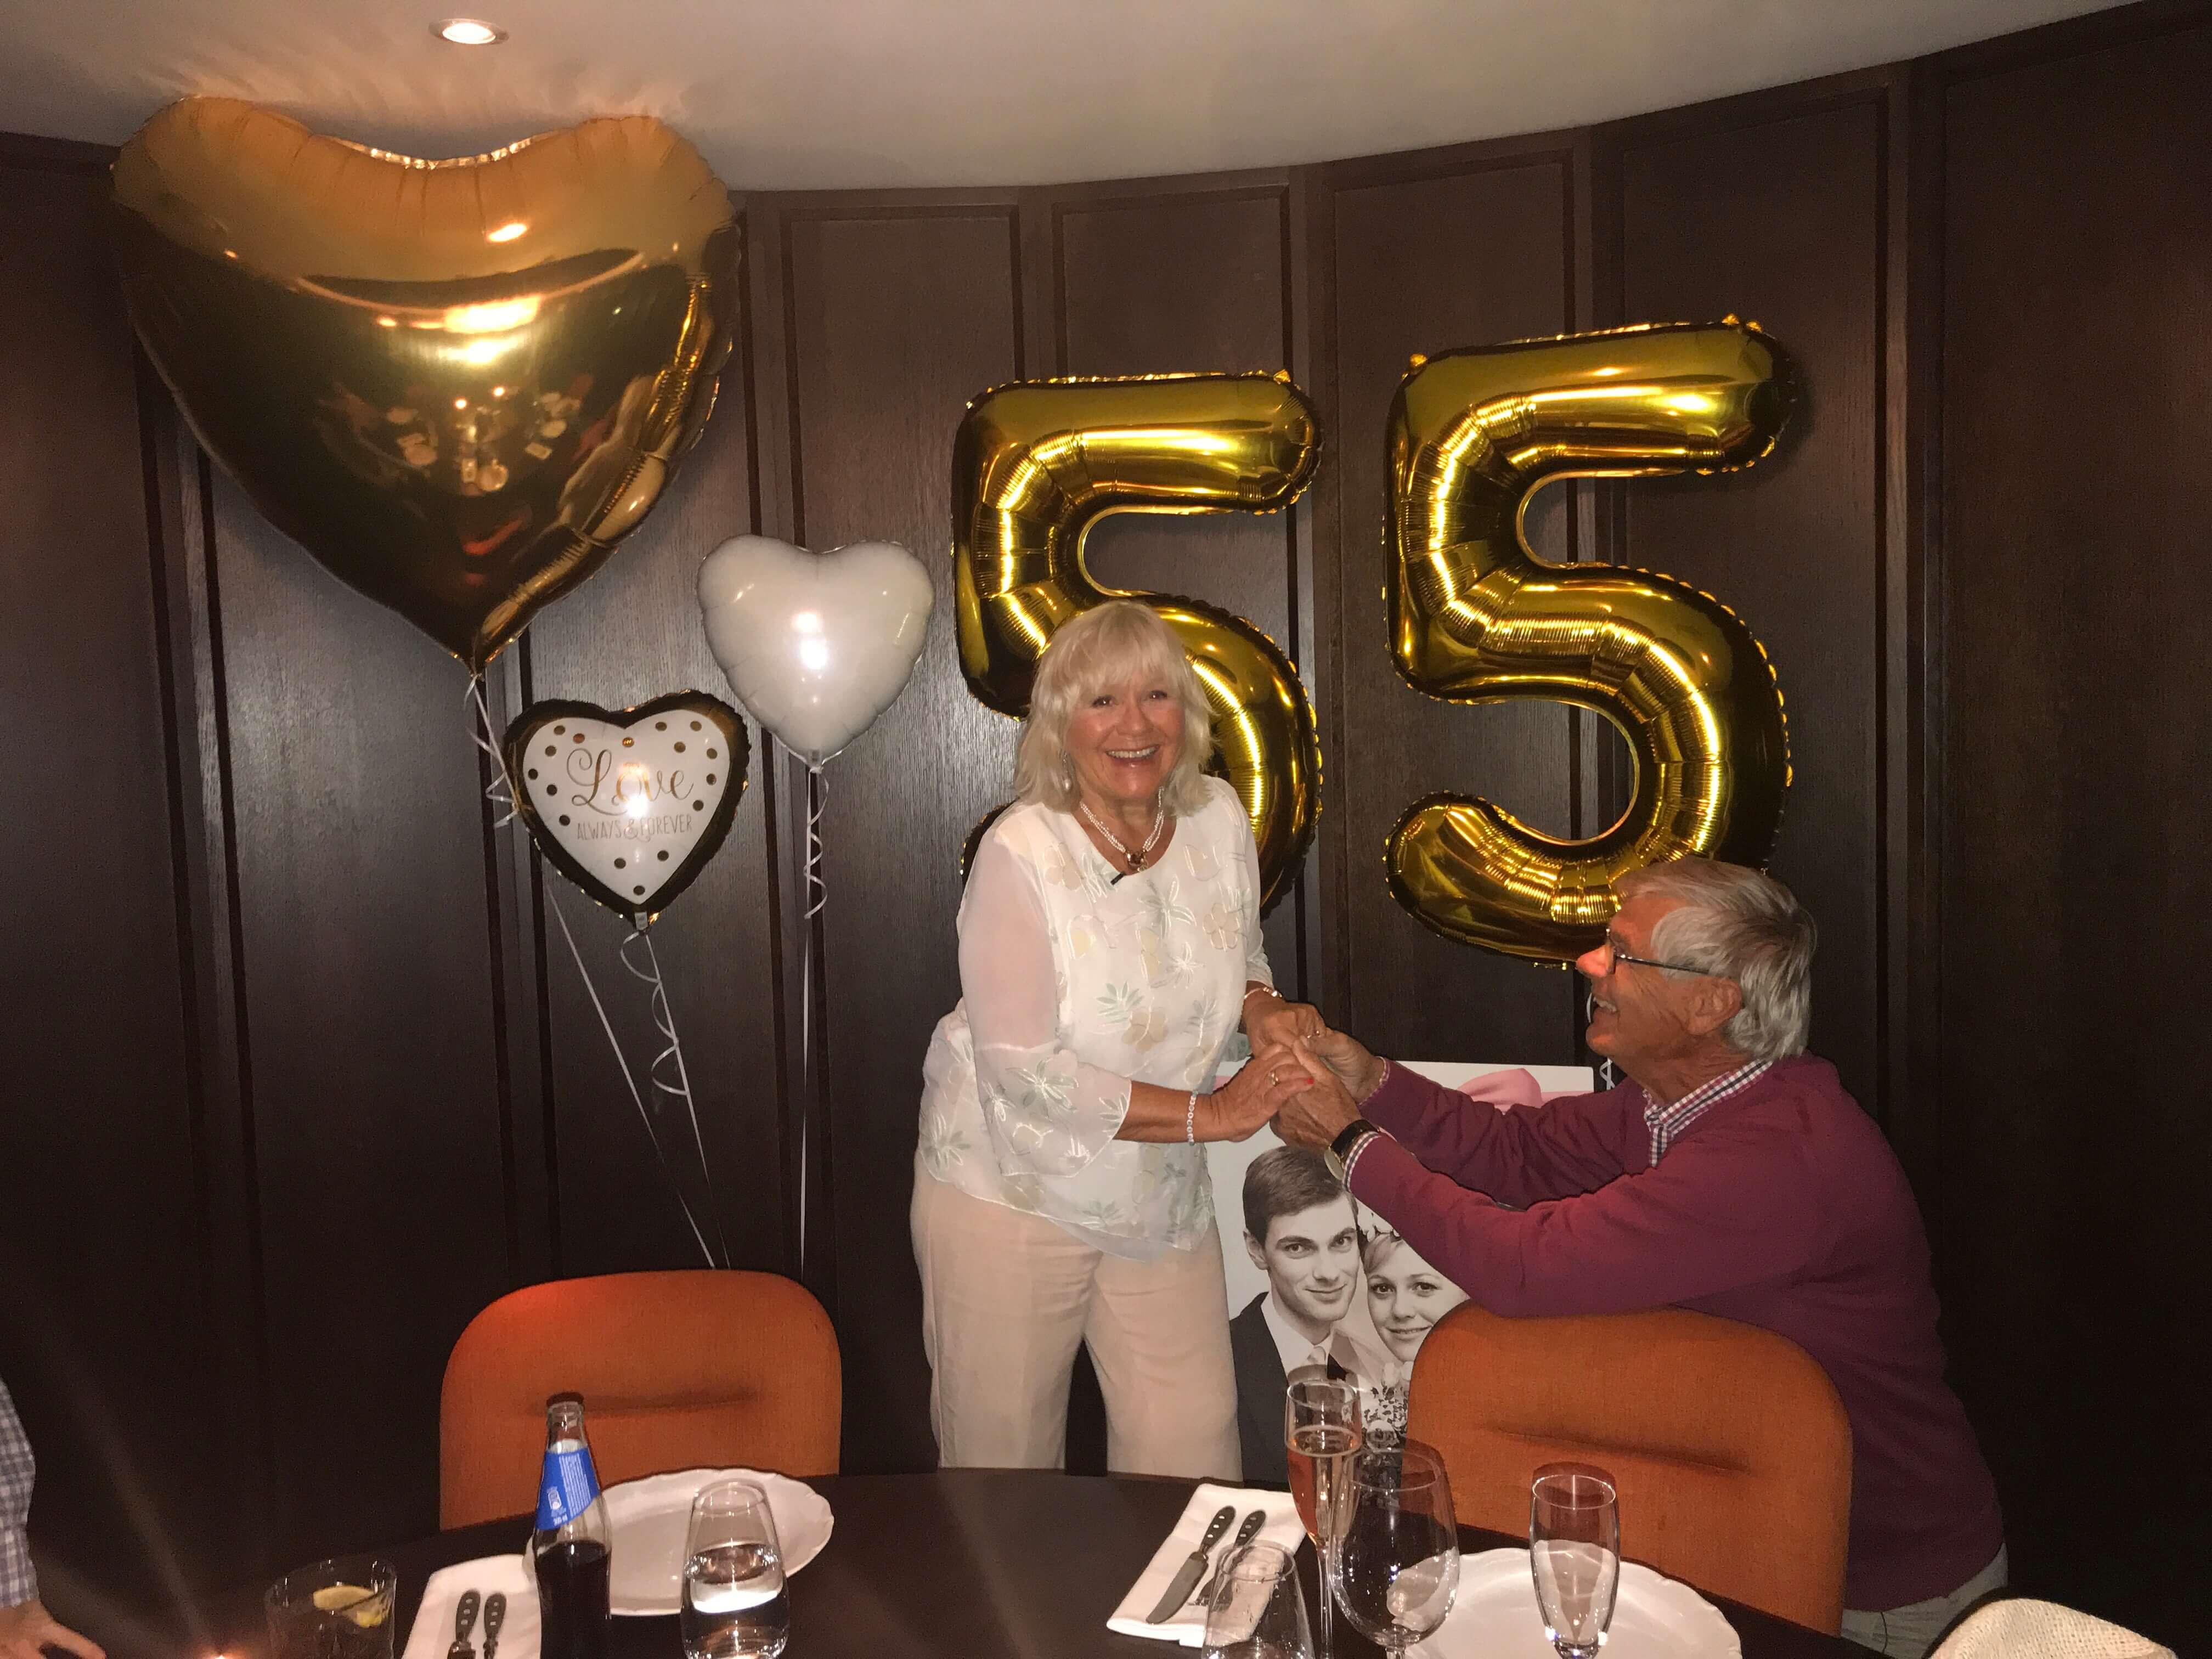 55 års bröllopsdag 55 årig bröllopsdag!!! 55 års bröllopsdag